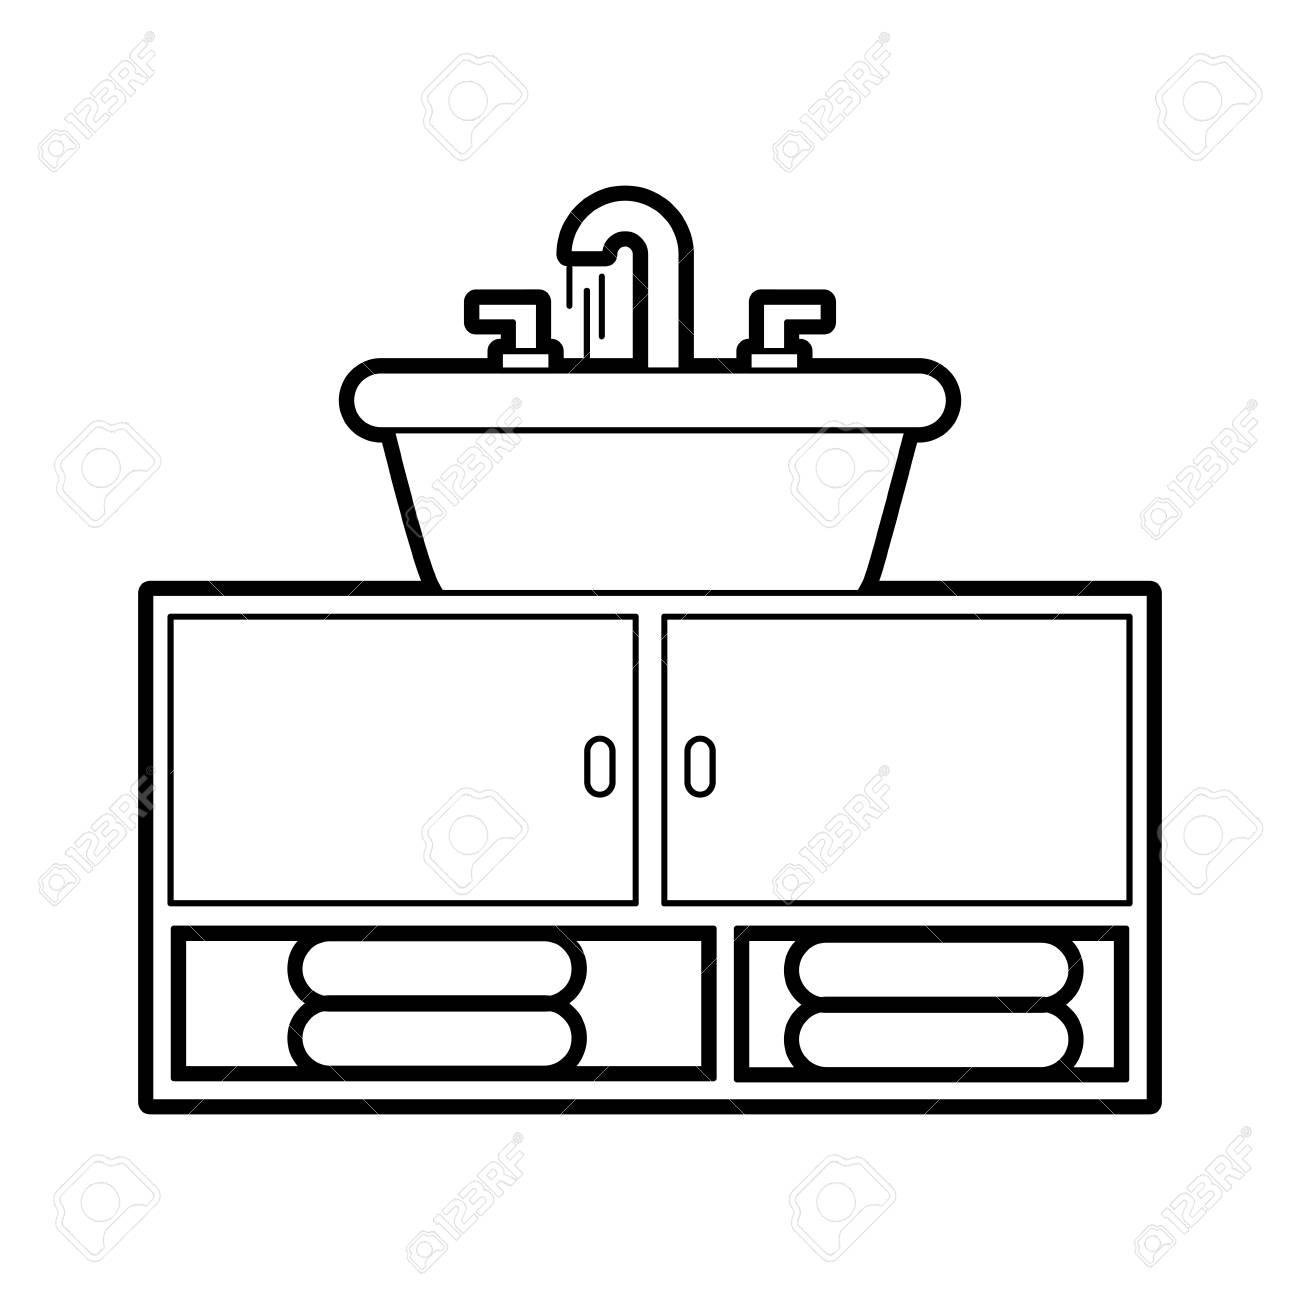 bathroom interior with sink vanity cabinet furniture vector illustration.